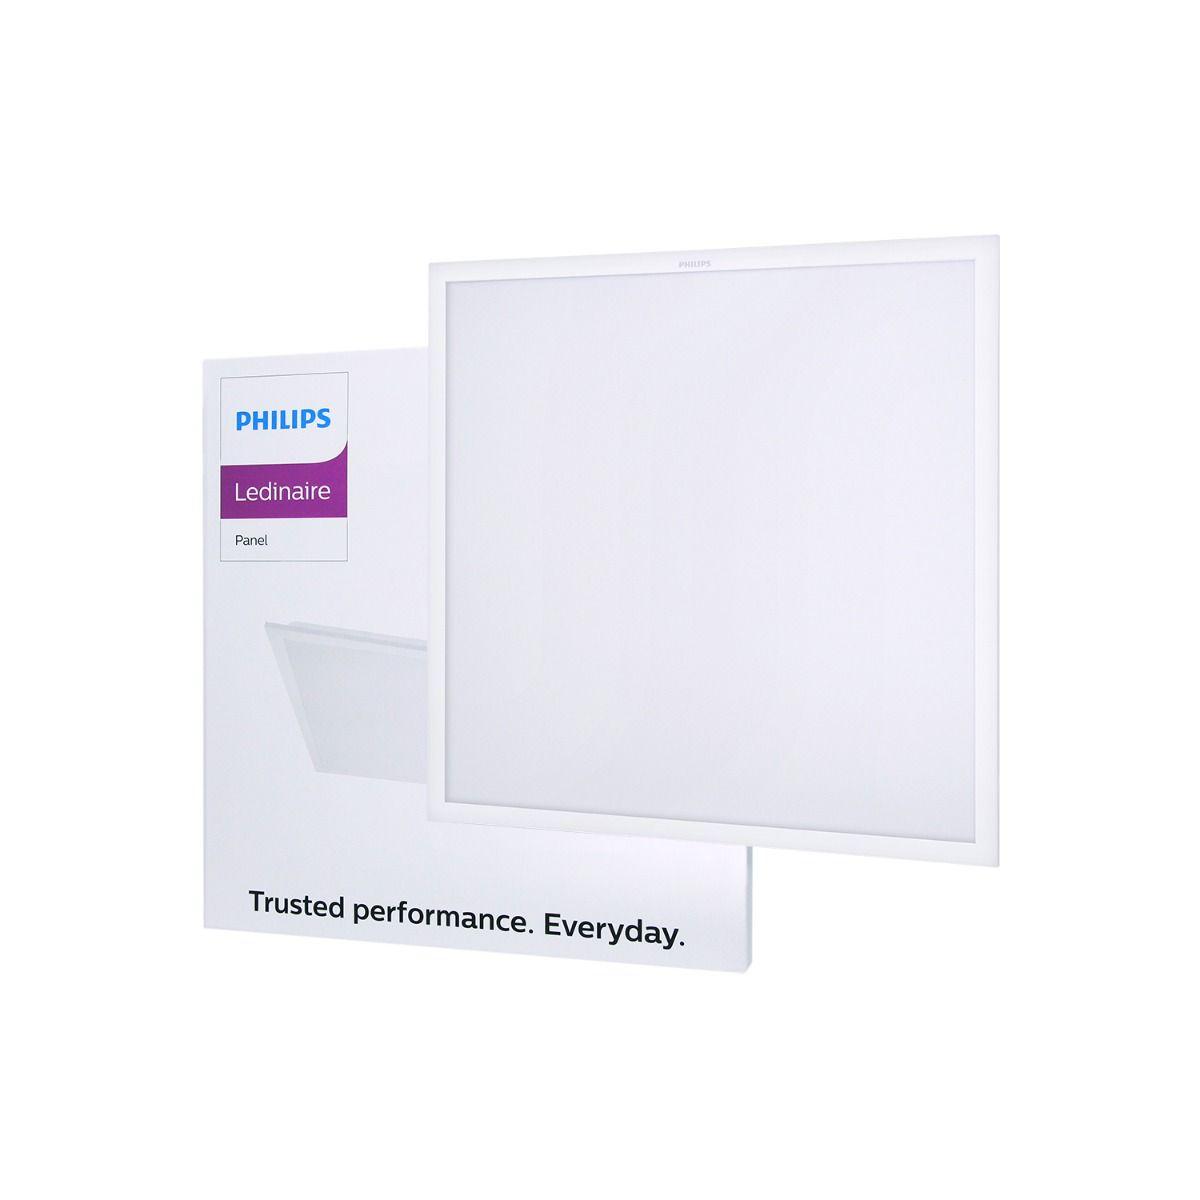 Philips Panel LED RC065B LED34S PSU W60L60 840 | Cool white